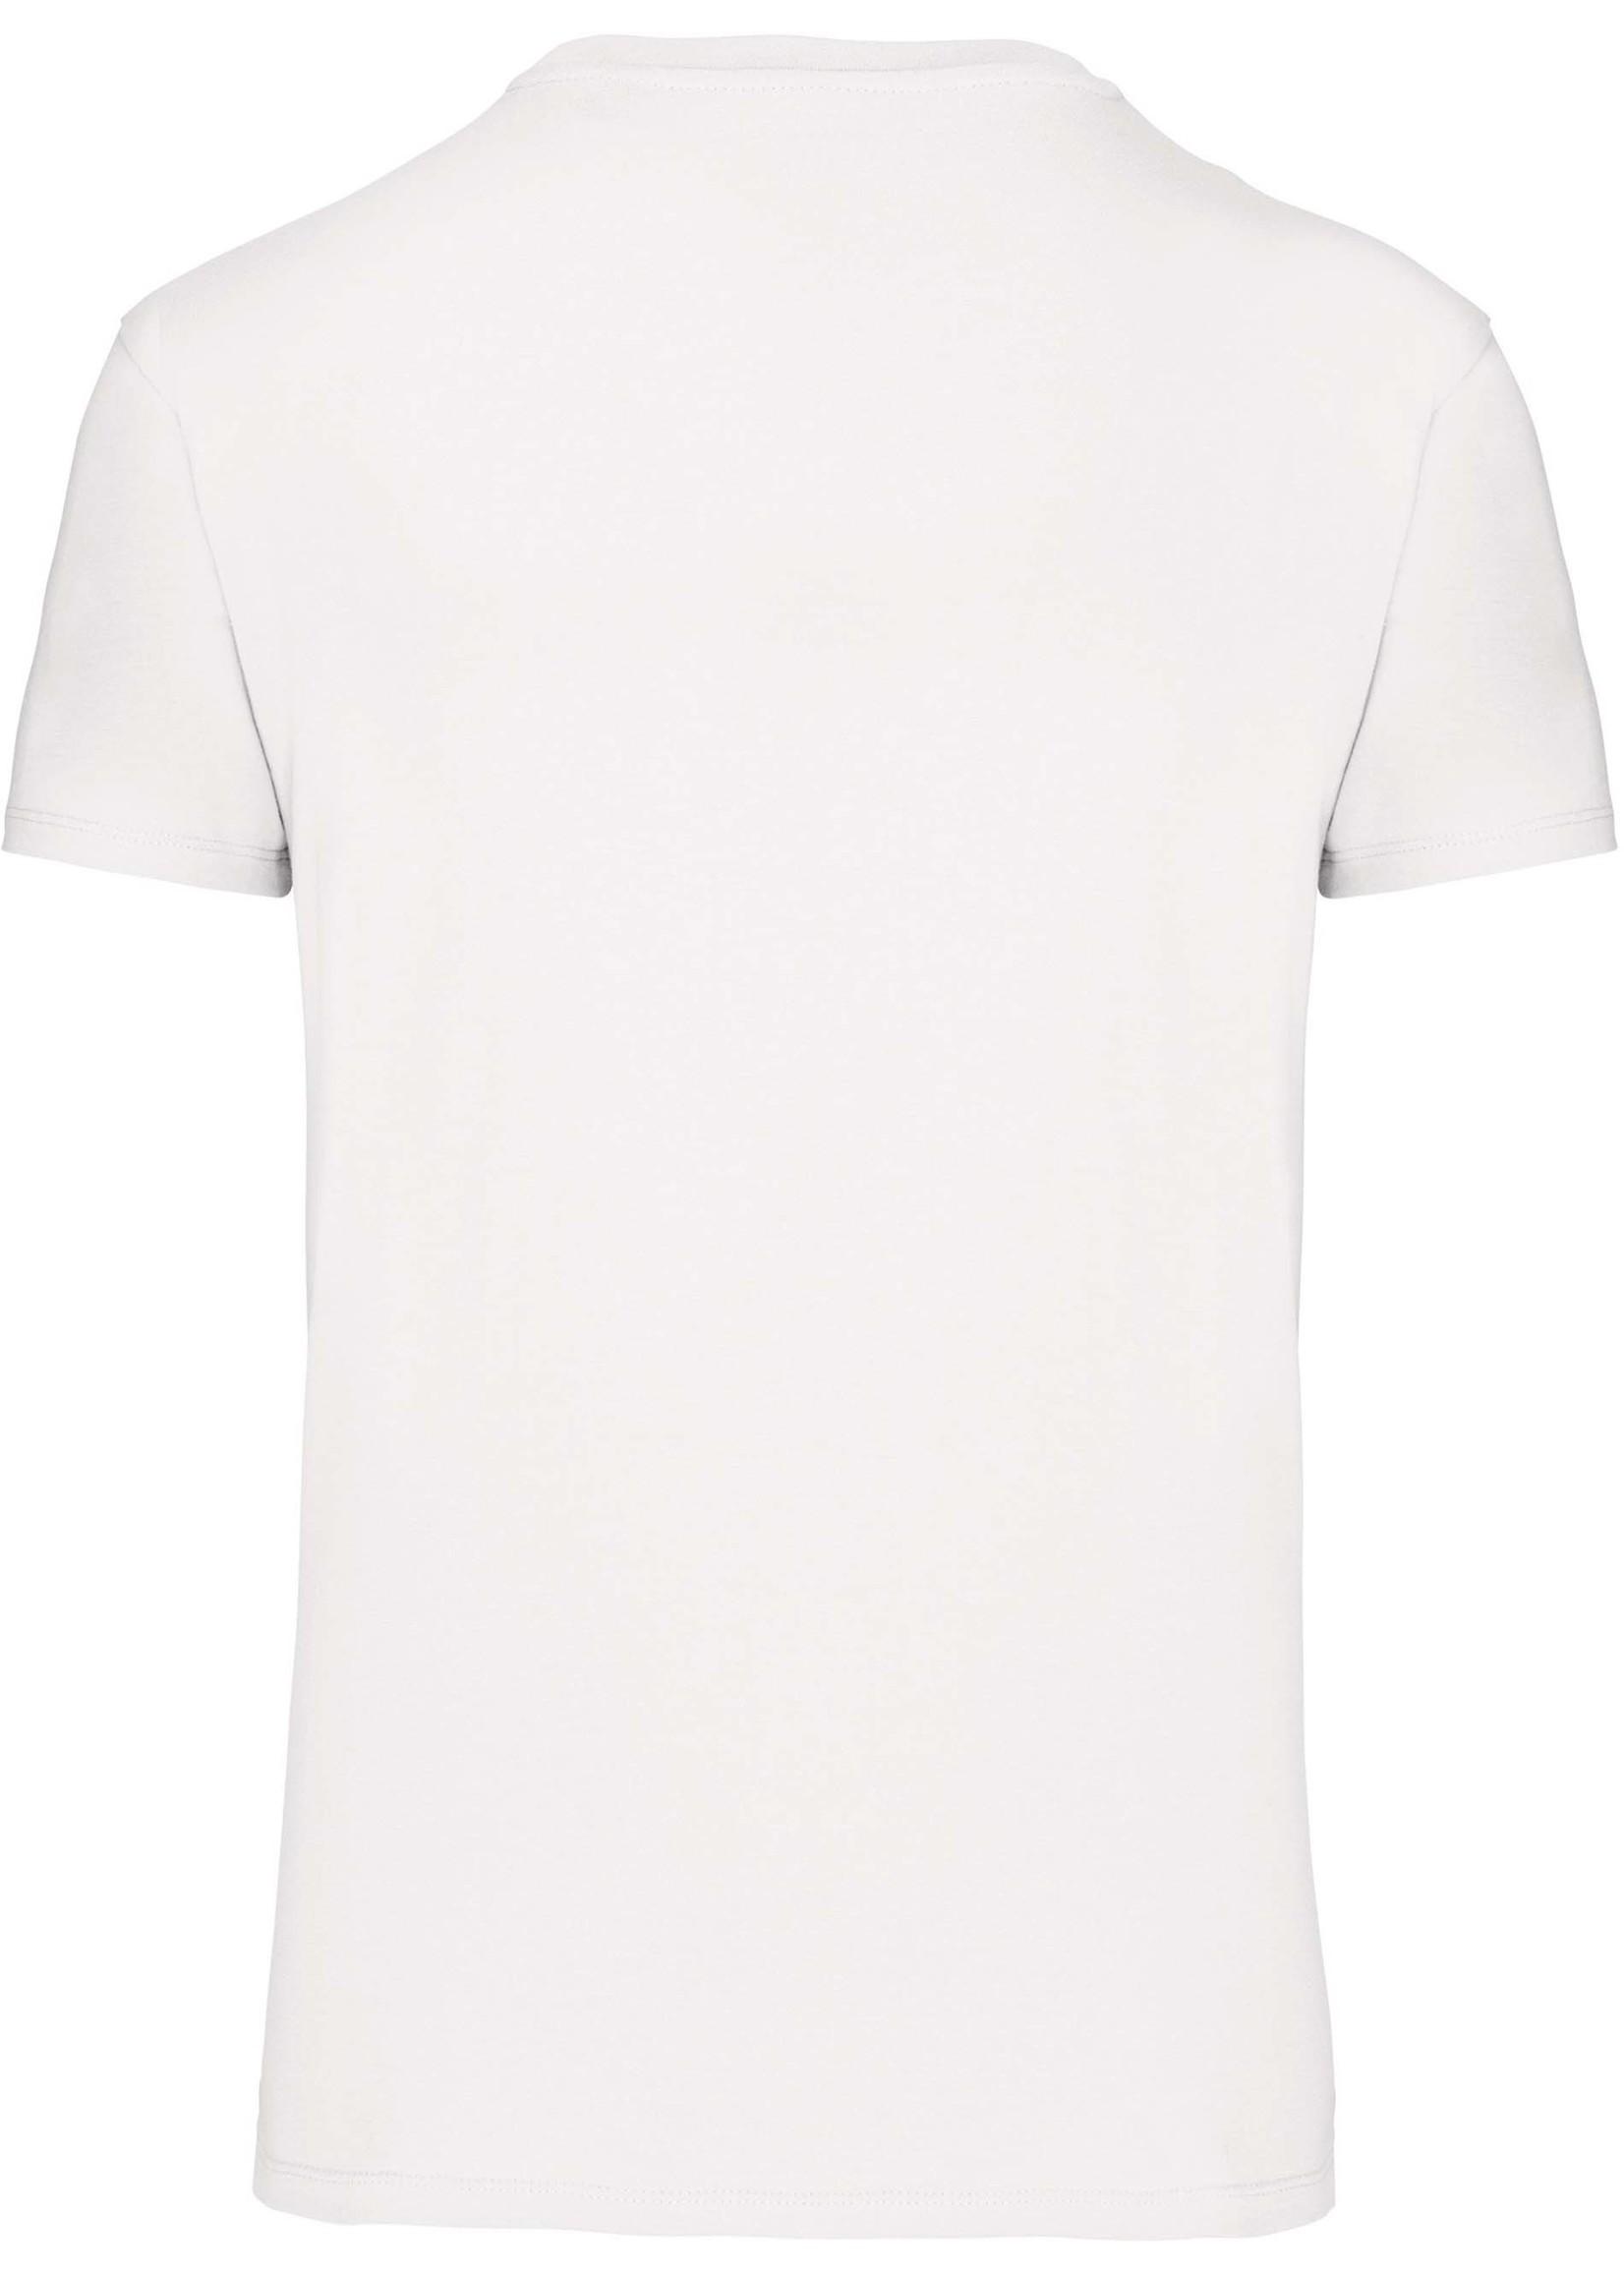 Eco-Friendly Unisex T-shirt - Wit